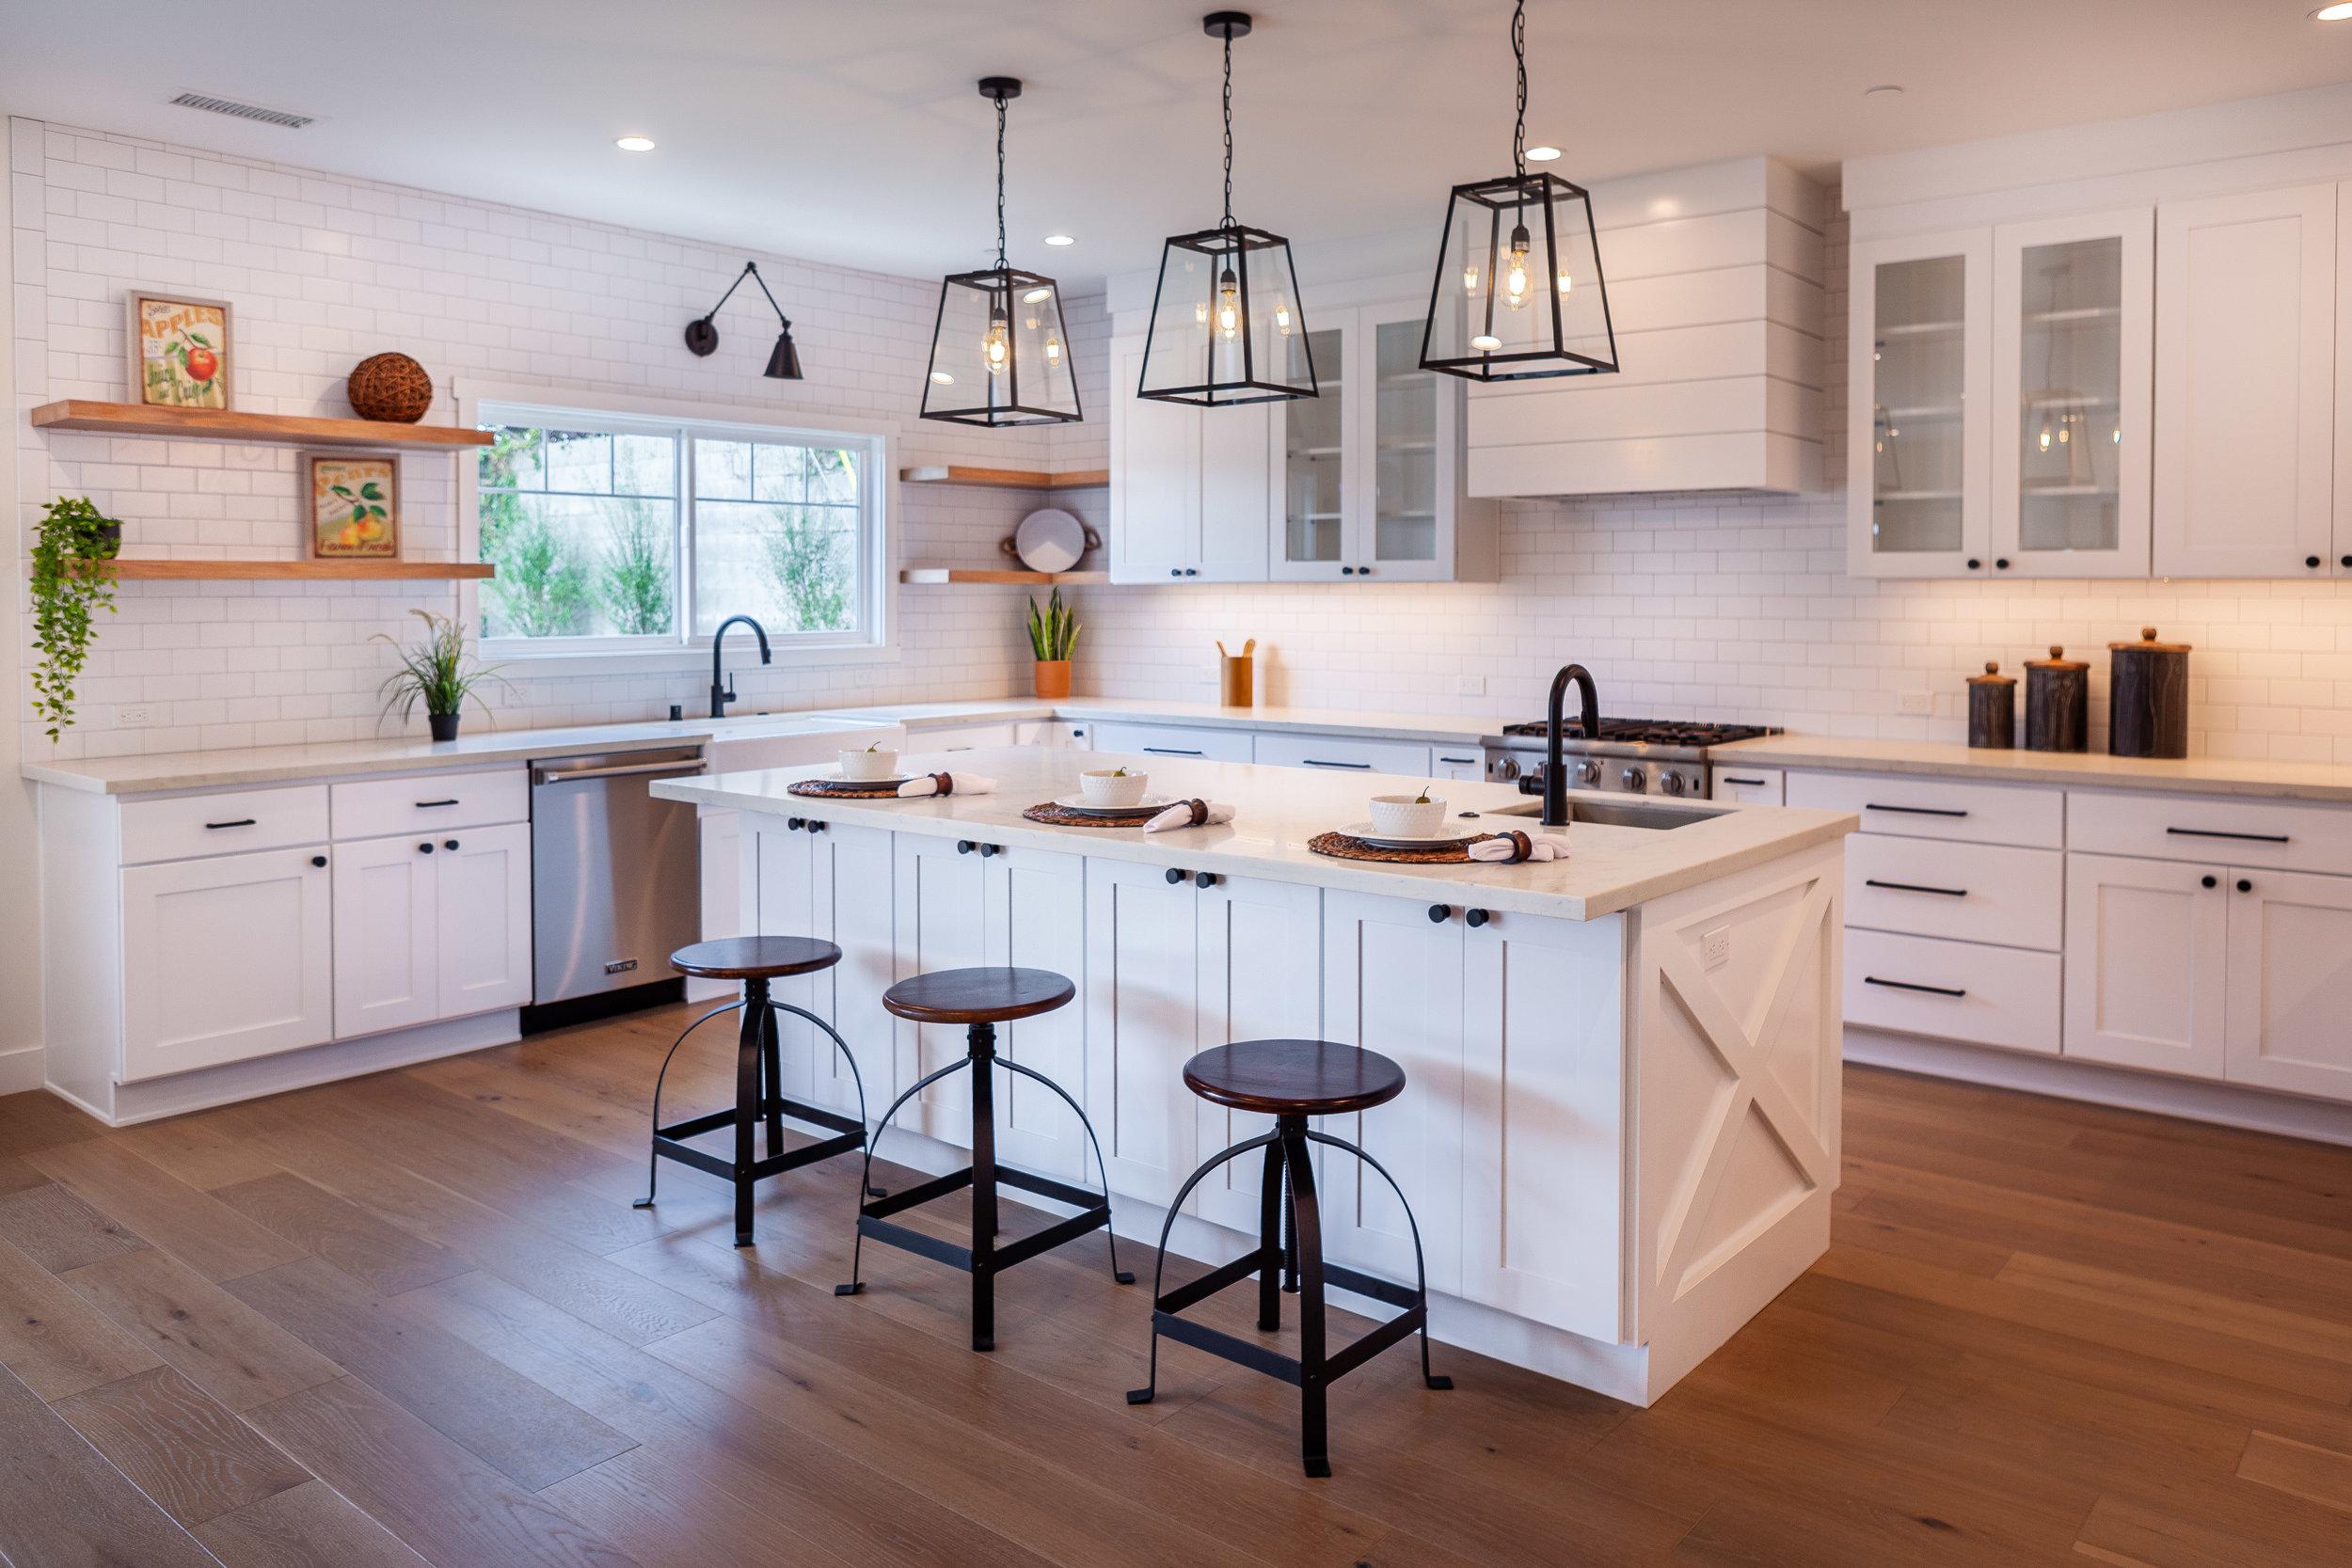 KitchenPortrait.jpg